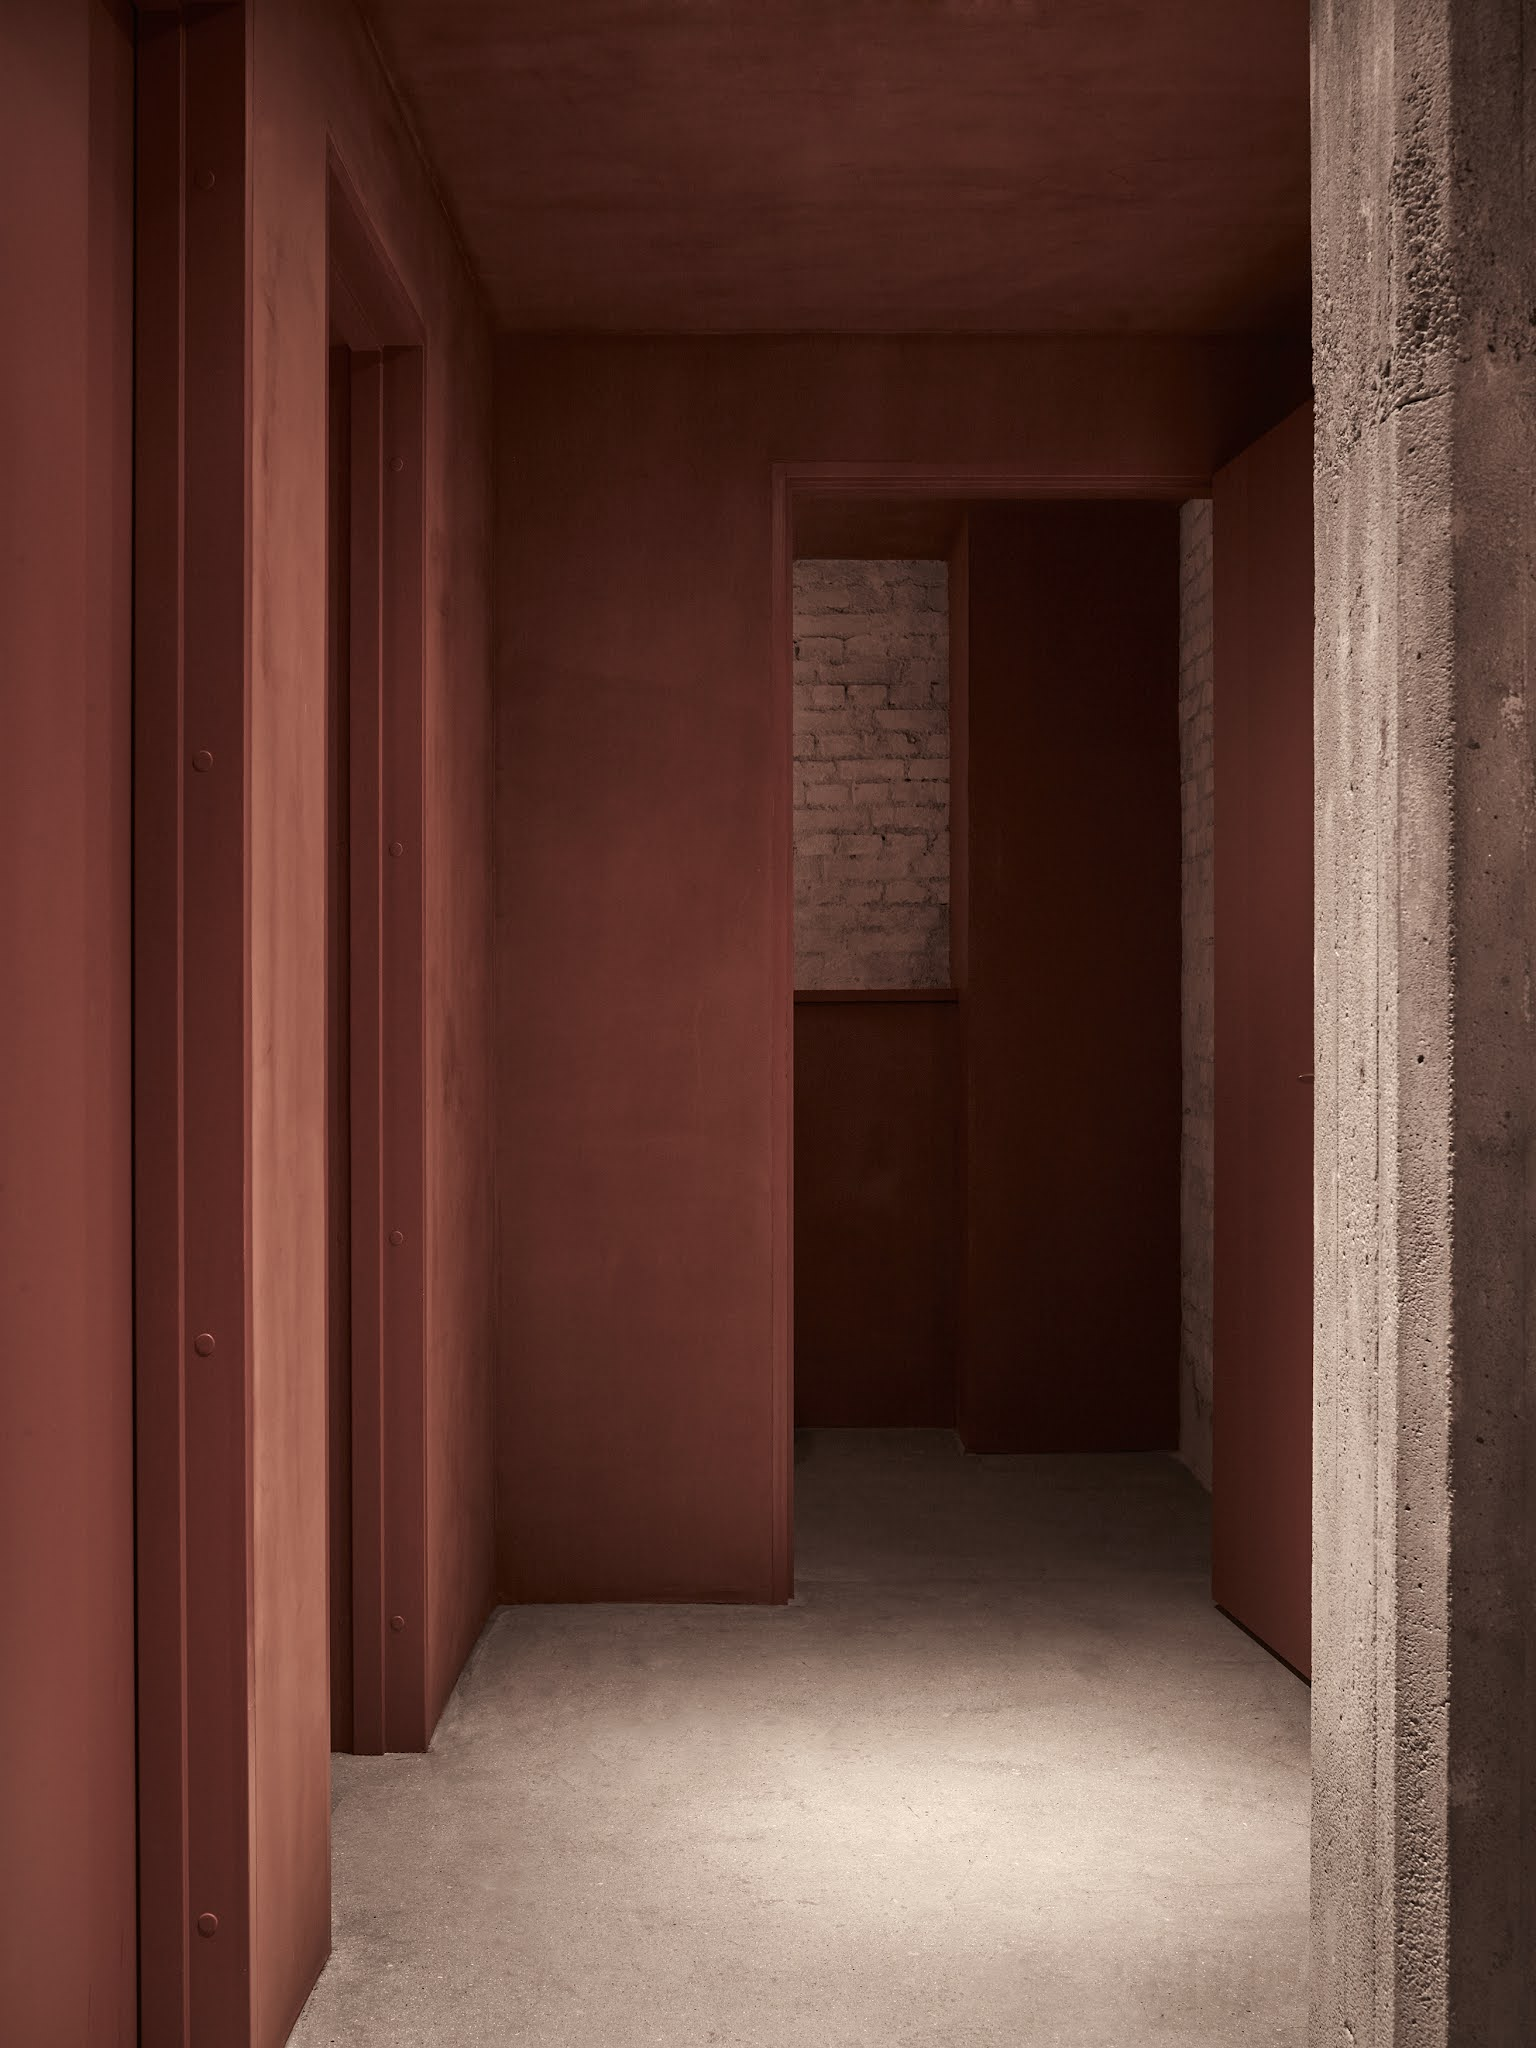 ilaria fatone - un couloir en terracotta